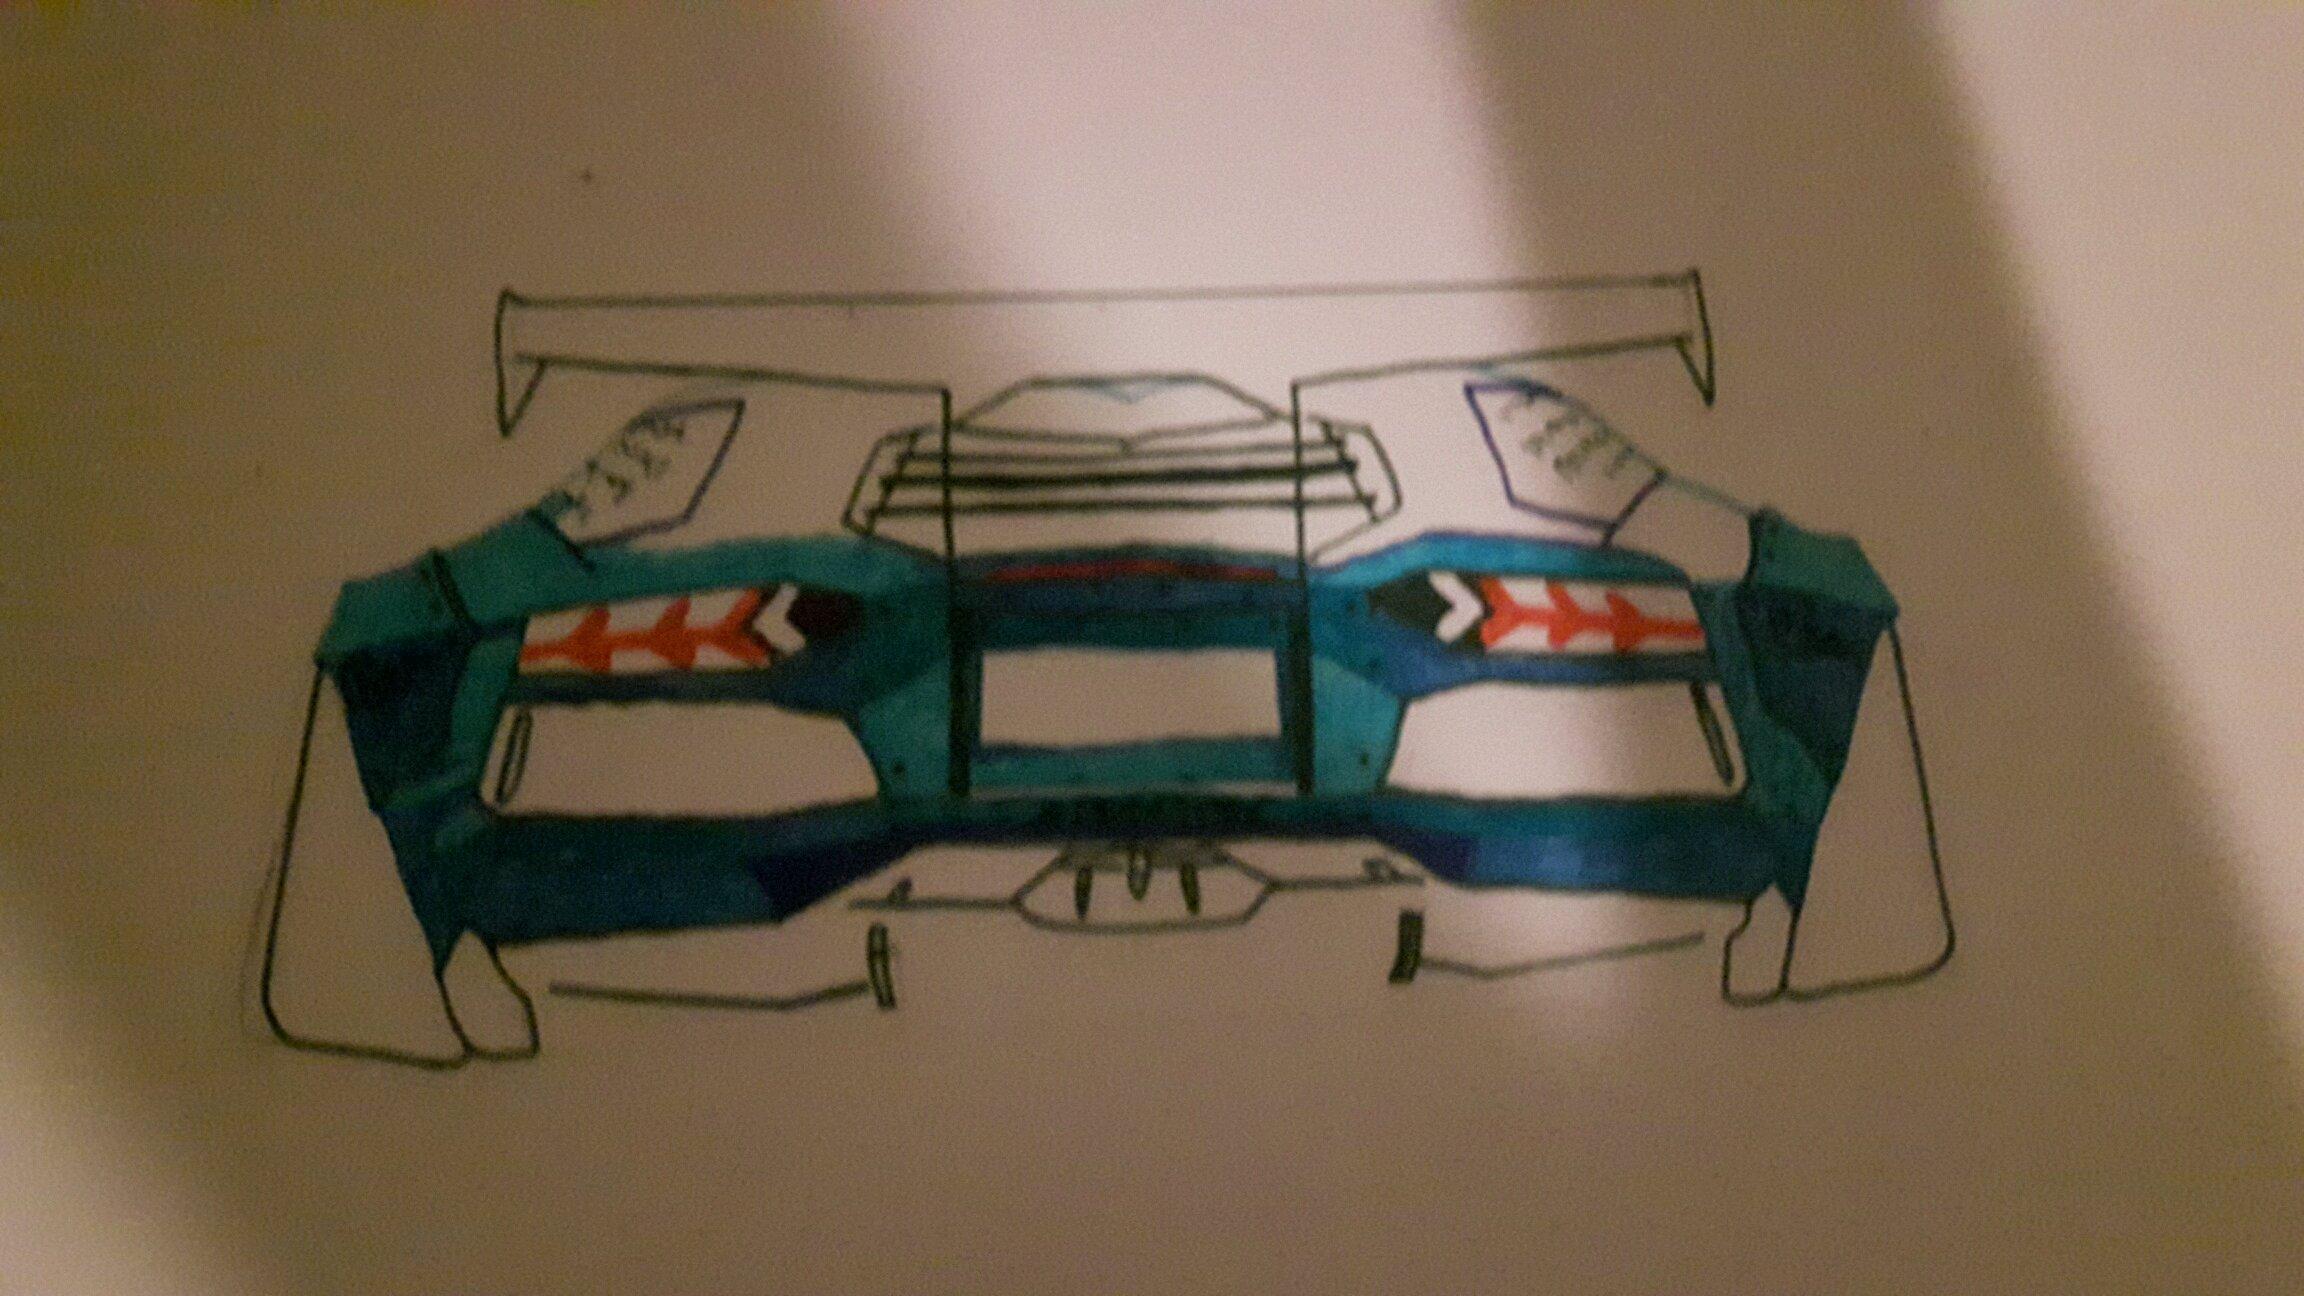 I Have Decided To Colour My Liberty Walk Aventador Blue